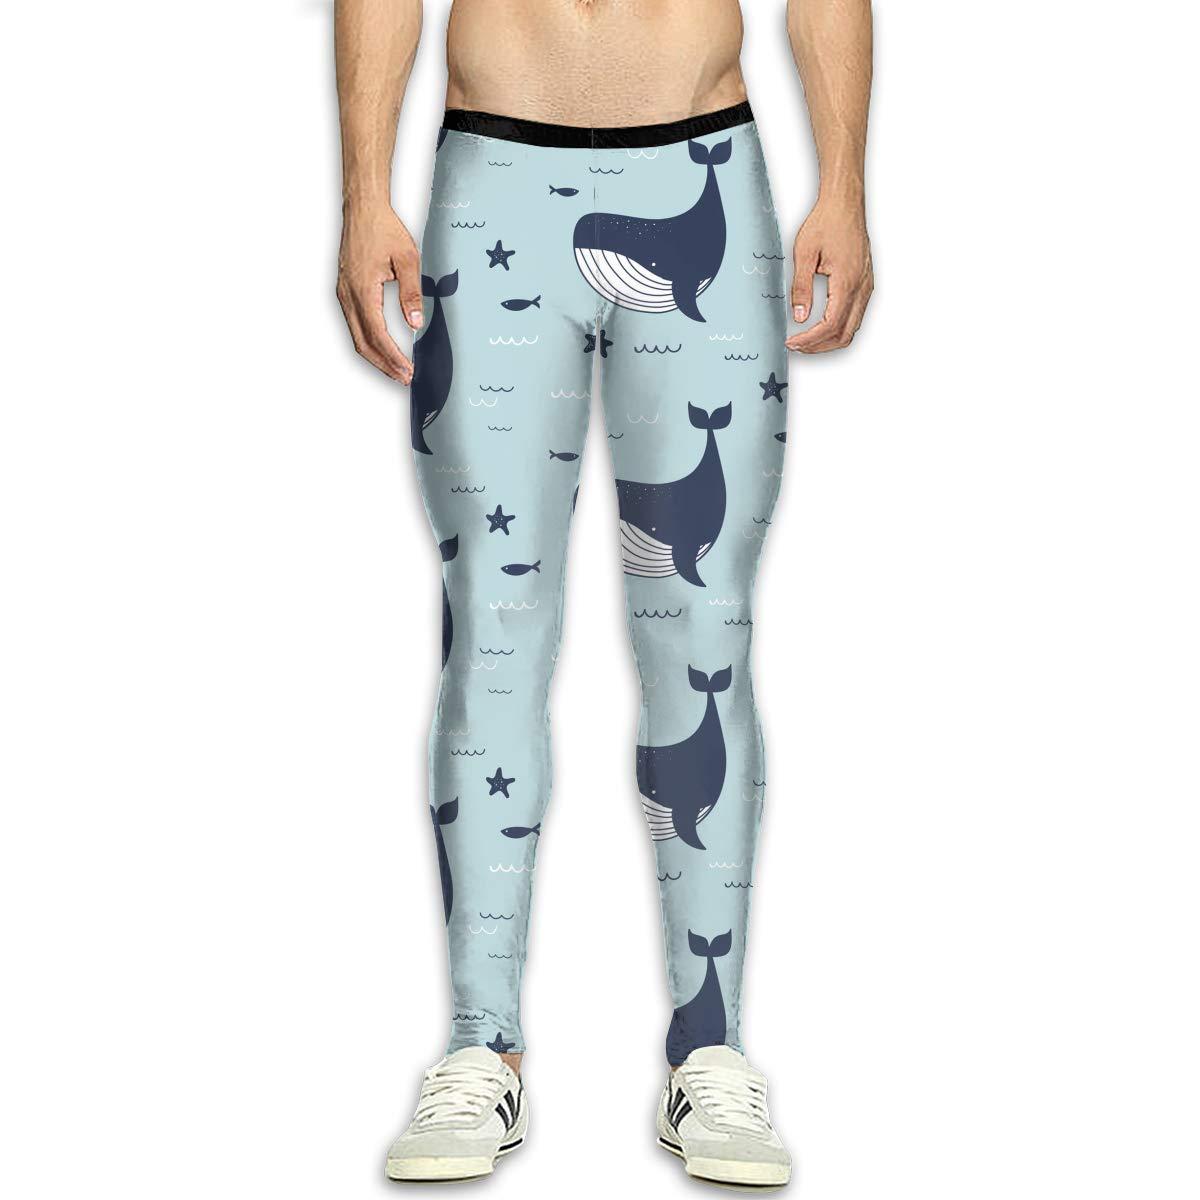 Amazon.com: Mens Whale Shark Warrior Art High Waist Skinny ...